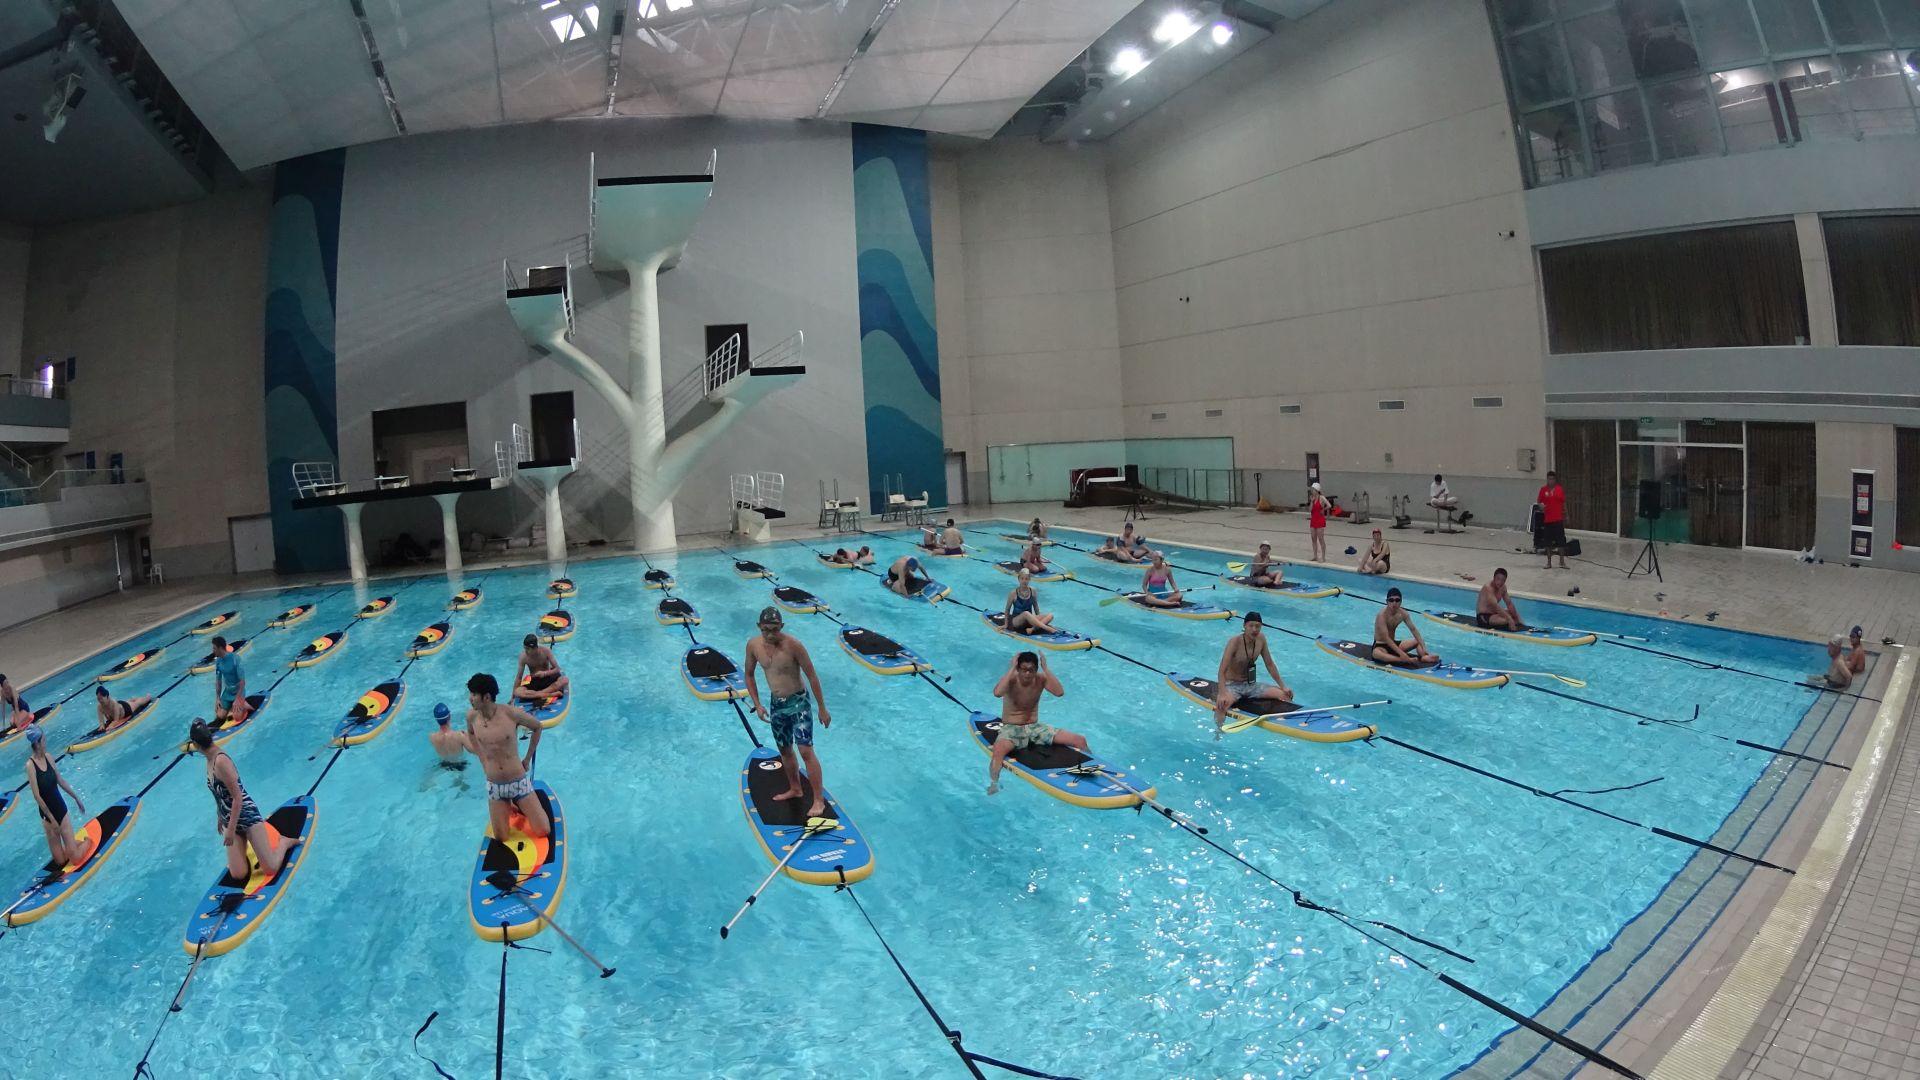 La chine d couvre le stand up paddle en piscine for Grosse piscine gonflable